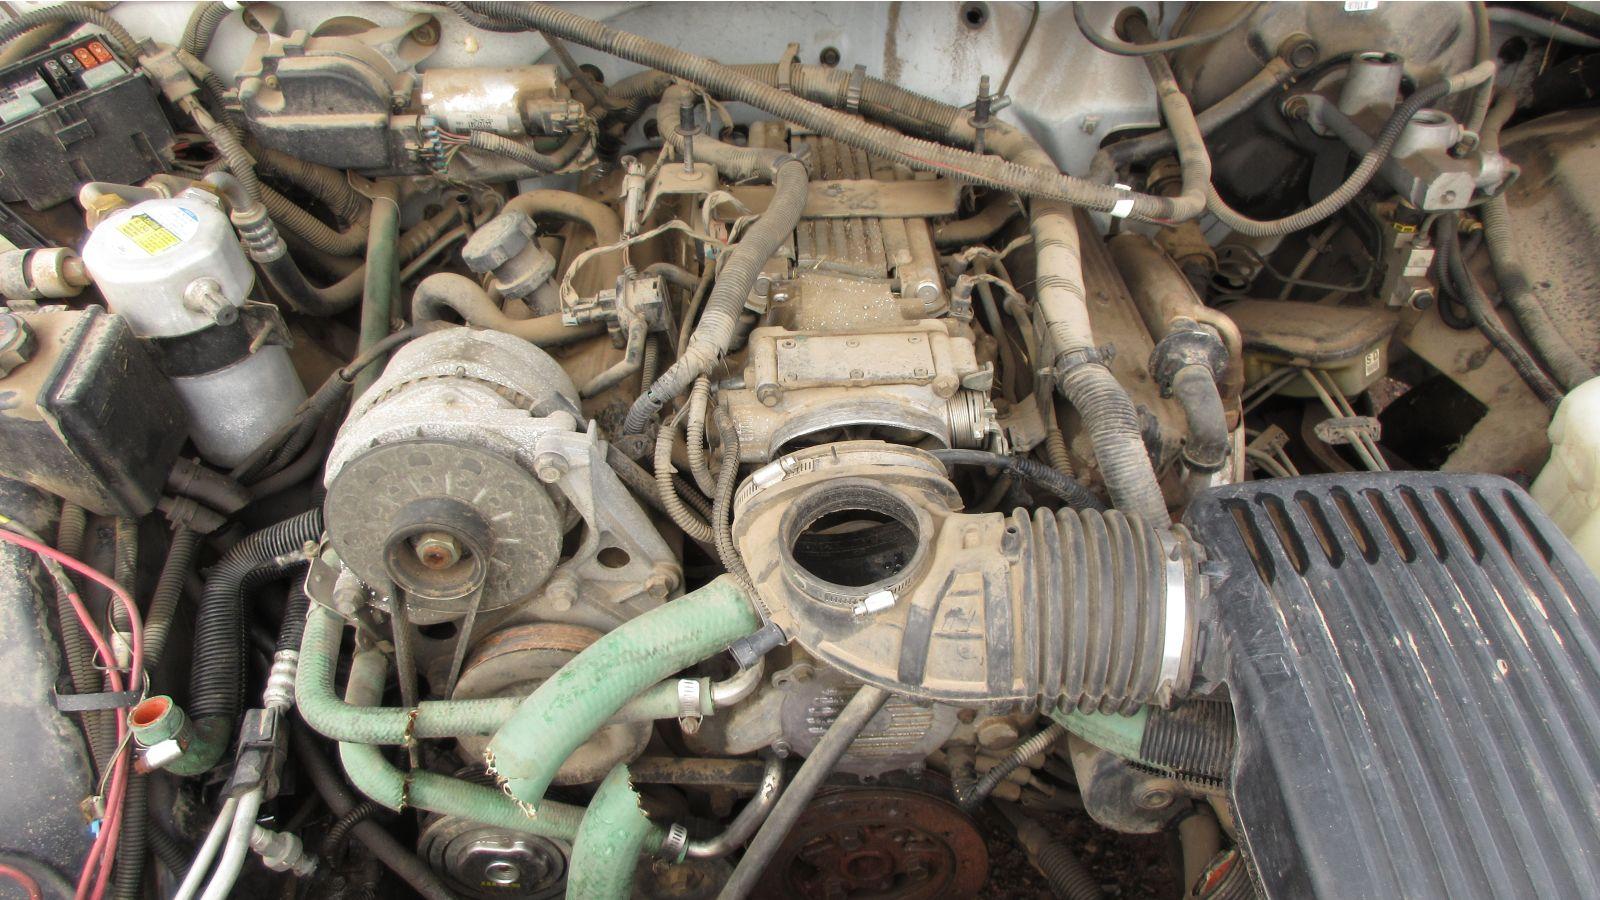 Chevrolet Caprice Classic 9C1 Police Car Junkyard Gem | Autoblog